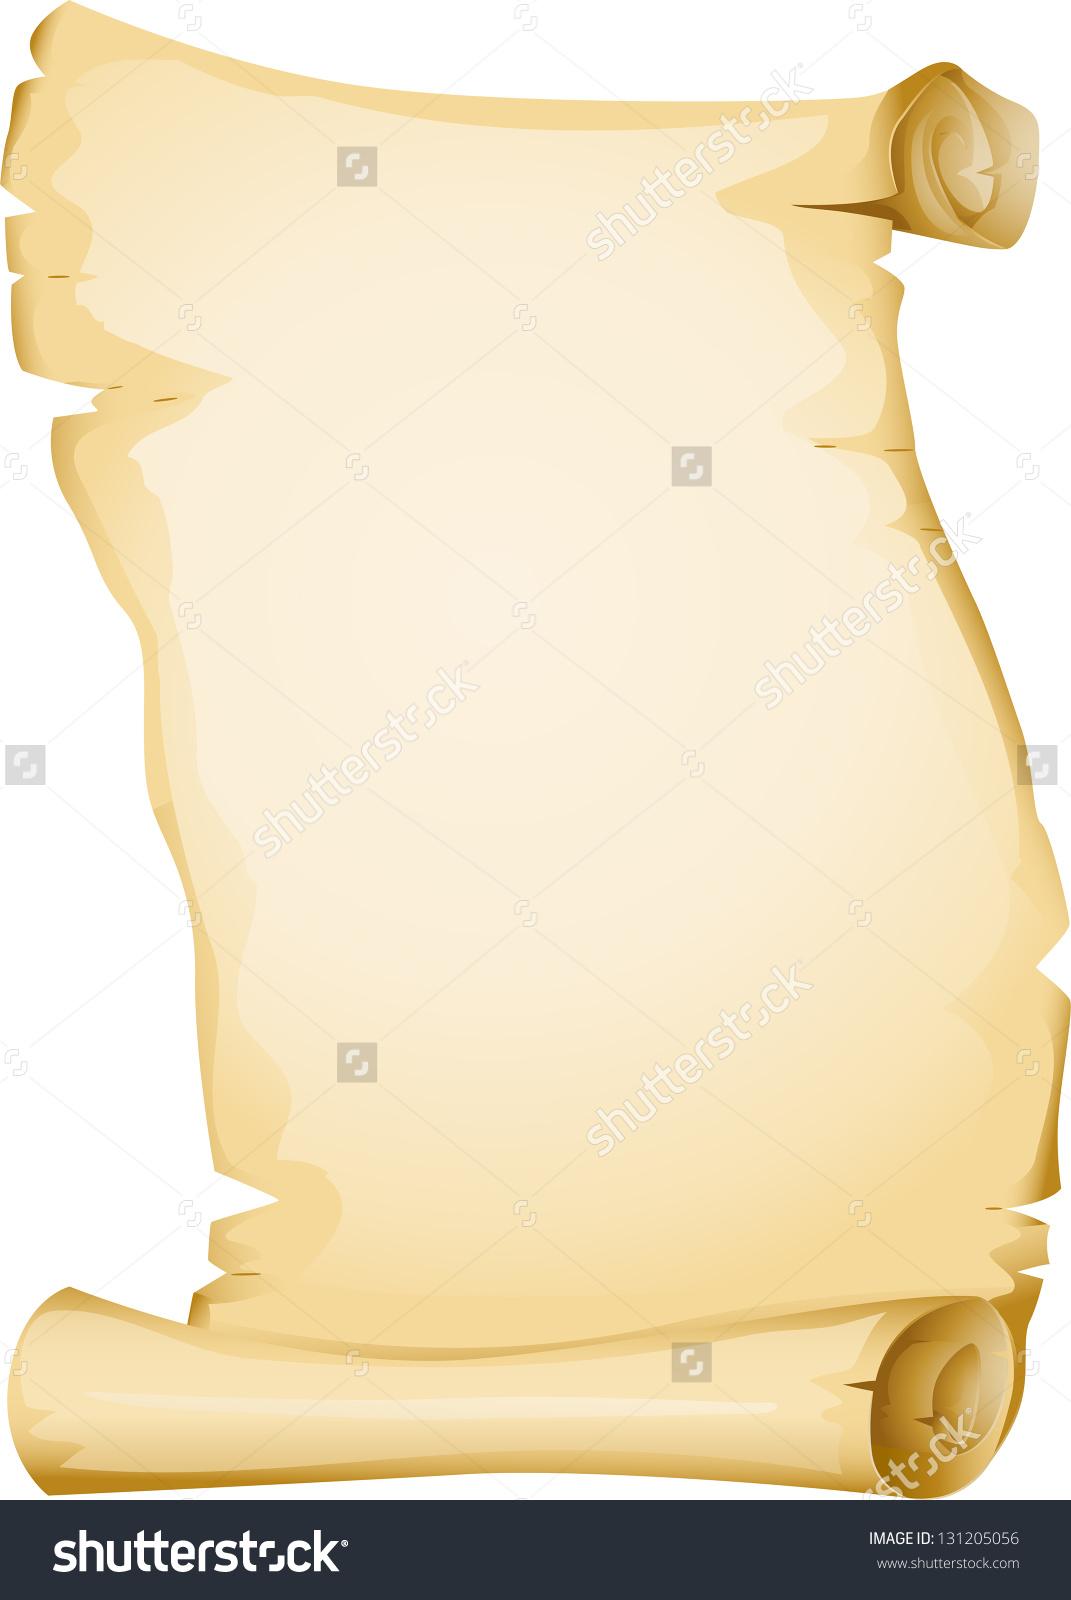 Scroll clipart blank Blank Blank Clipart scroll clipart